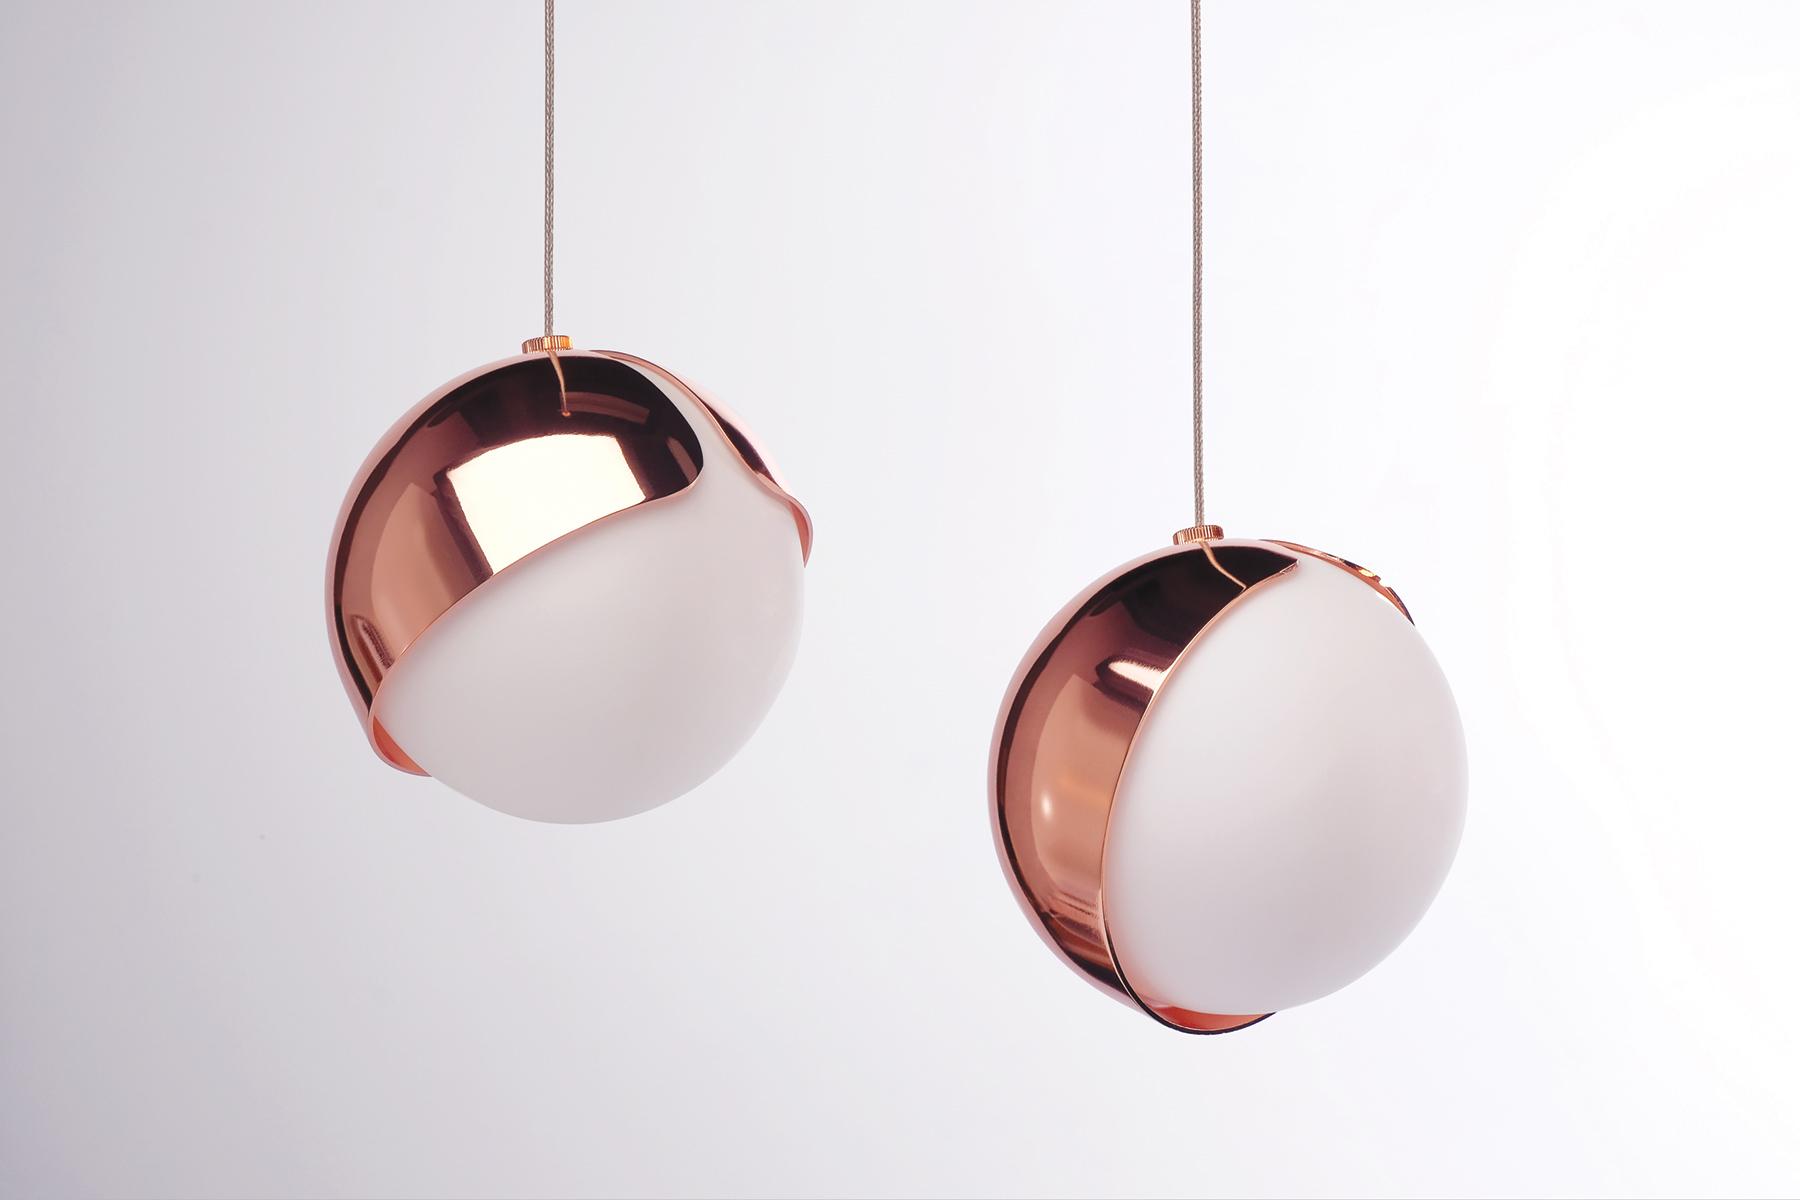 Toronto studio Anony's Ohm pendant features an orbiting metal shade